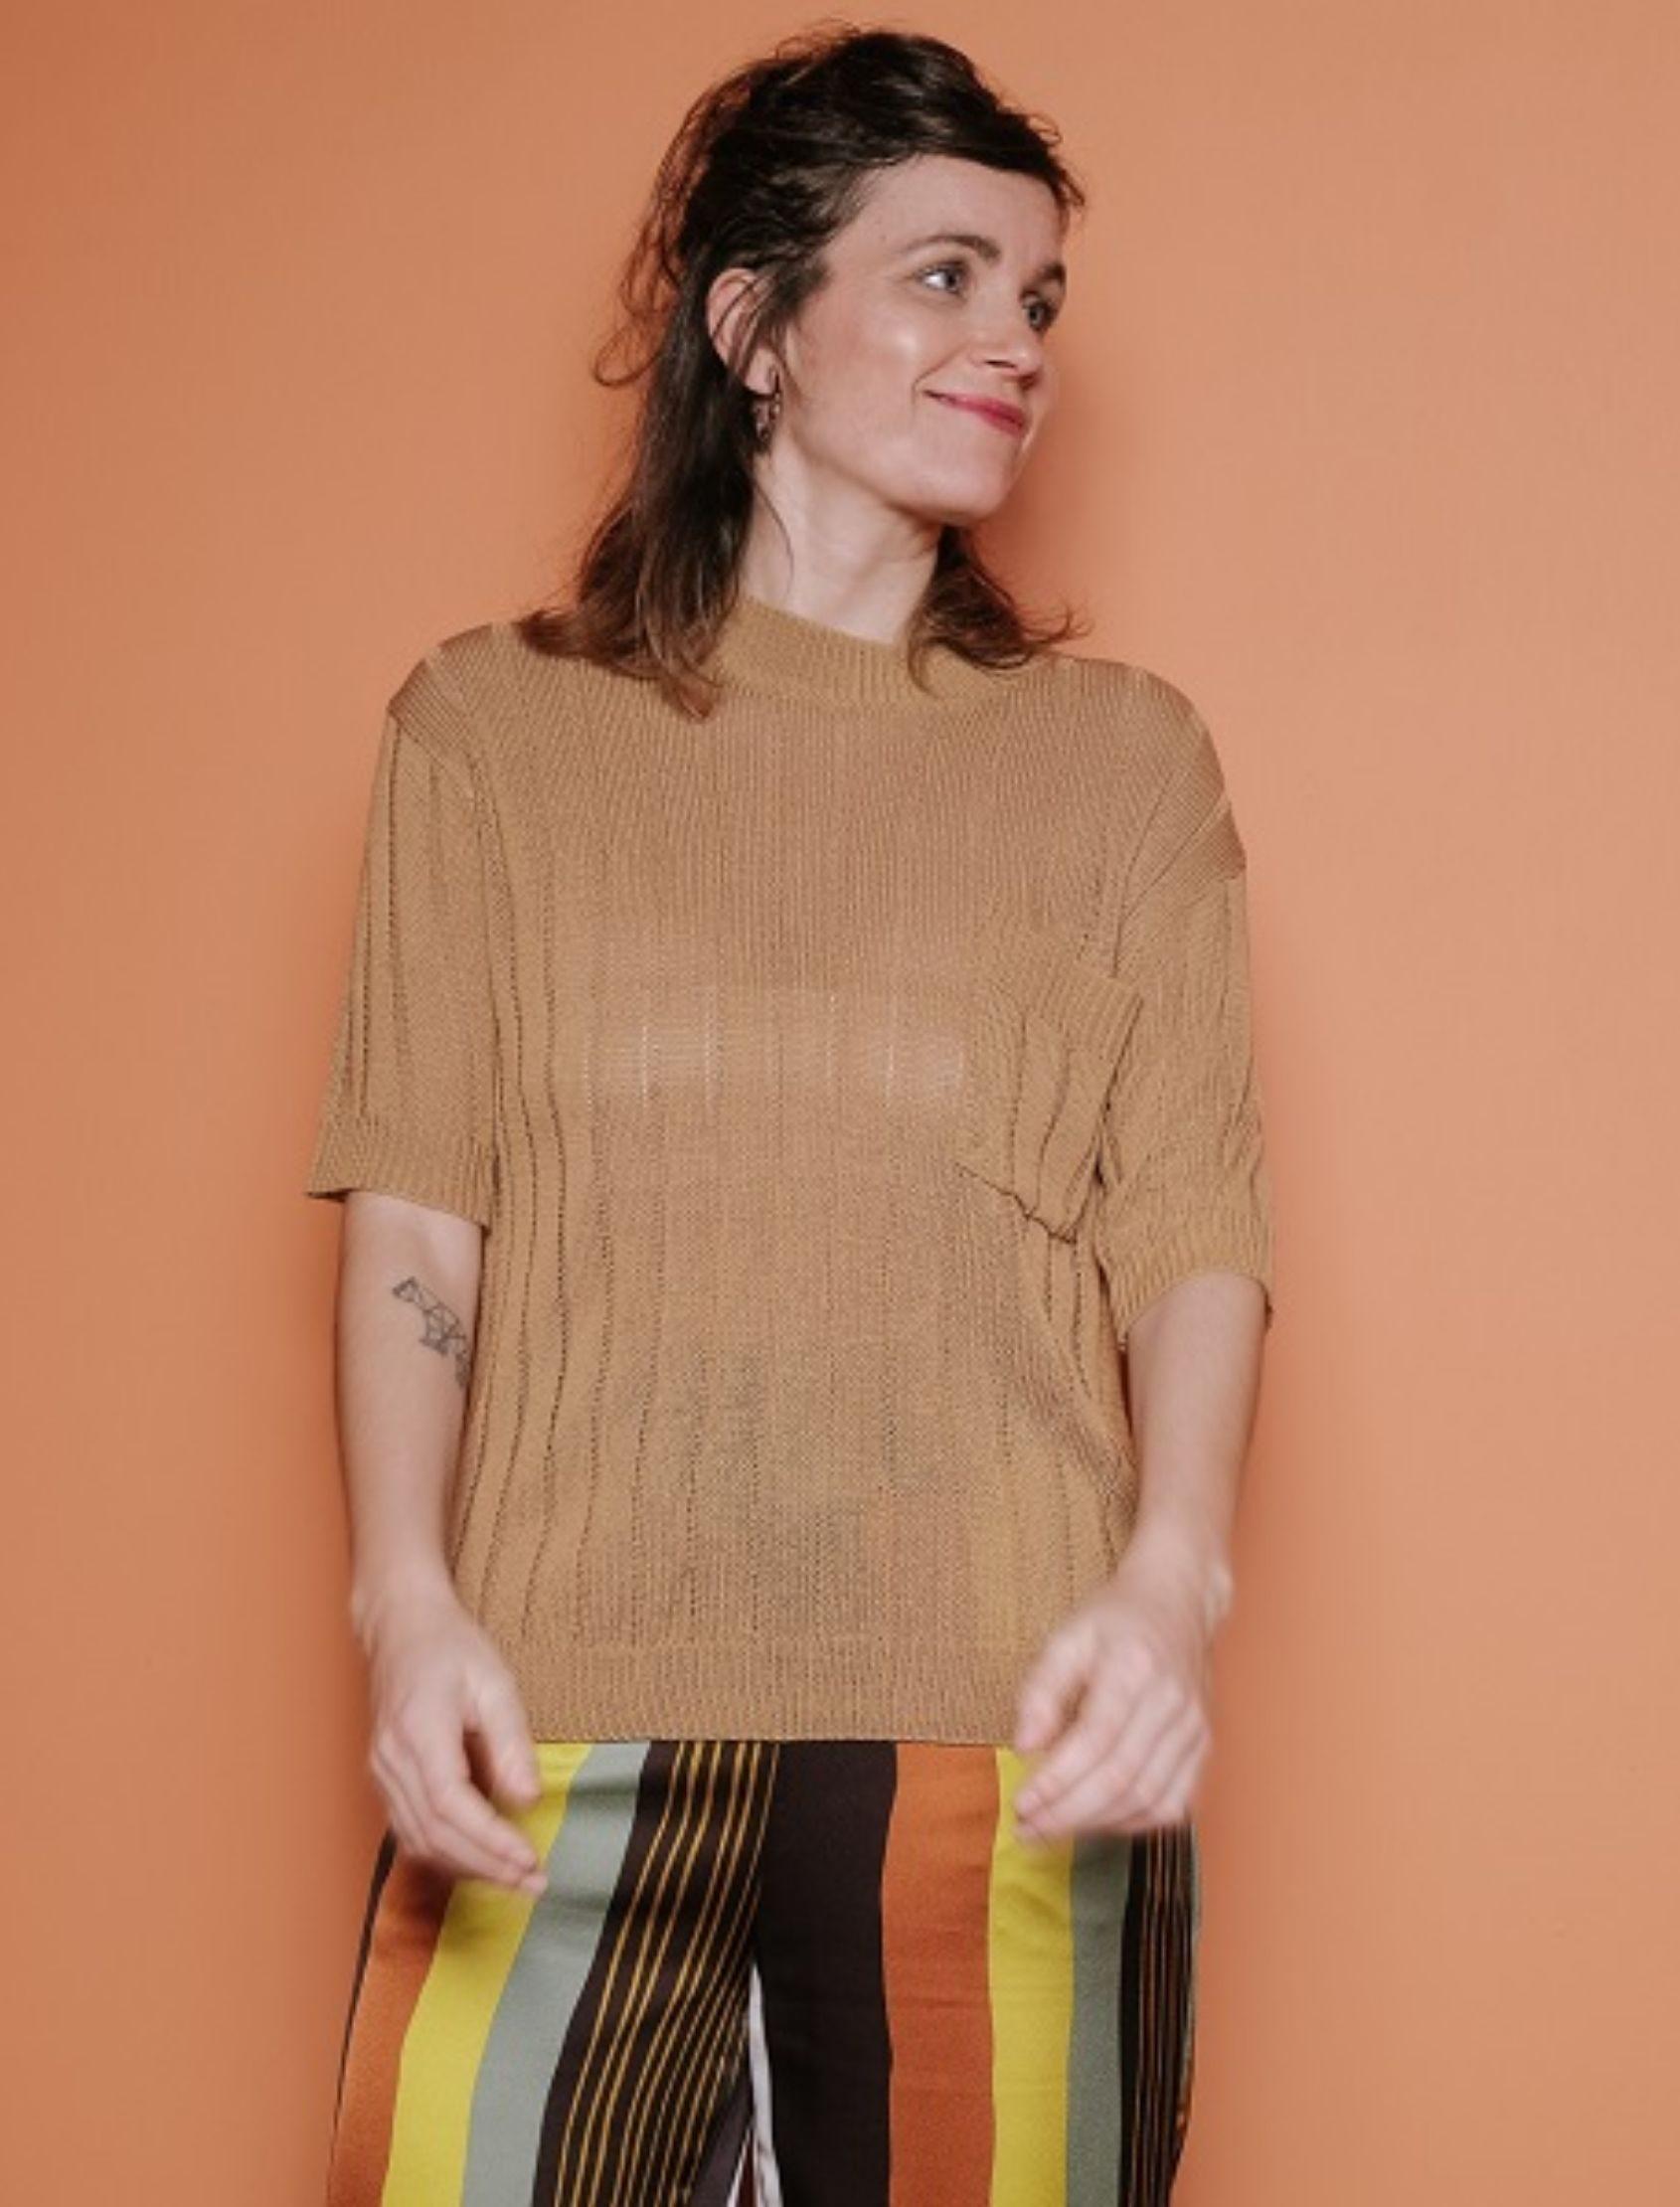 Modelo con jersey de punto canalé de manga corta en camel de la marca Skatïe